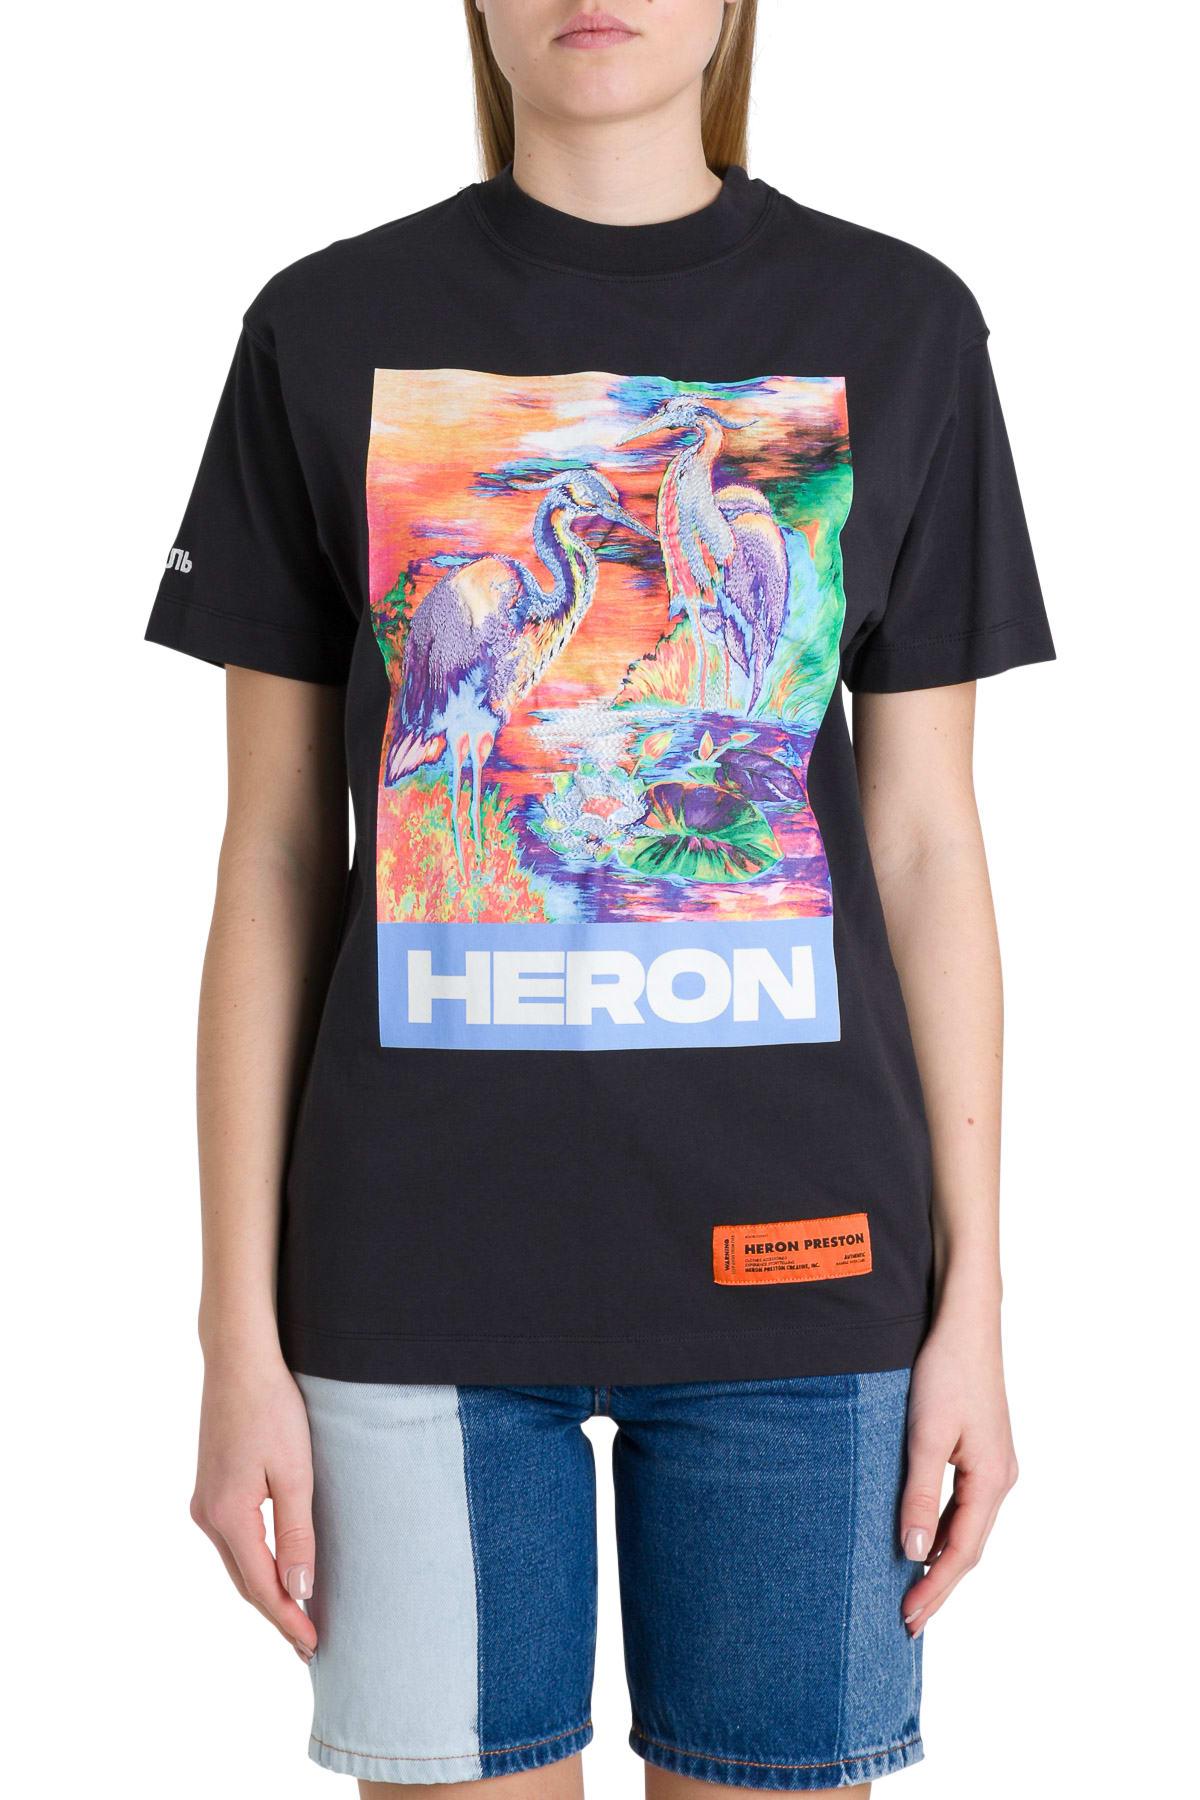 HERON PRESTON BIRDS TEE